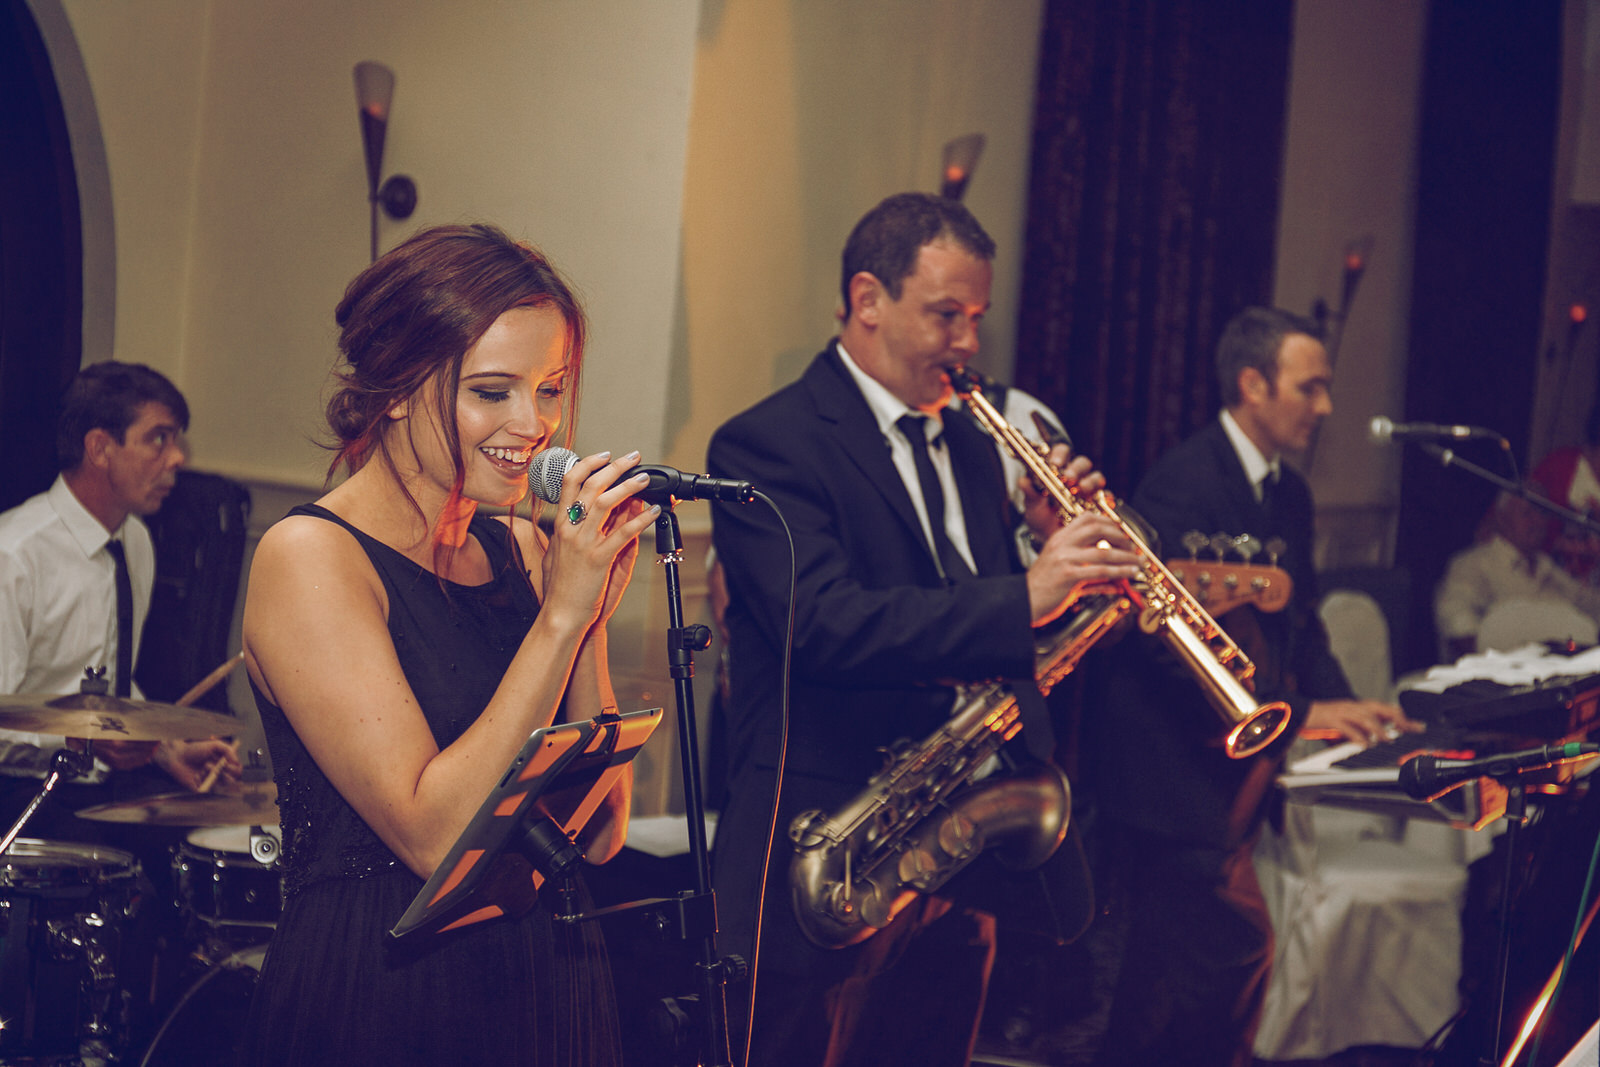 Brooklodge-wicklow-wedding-photographer_143.jpg